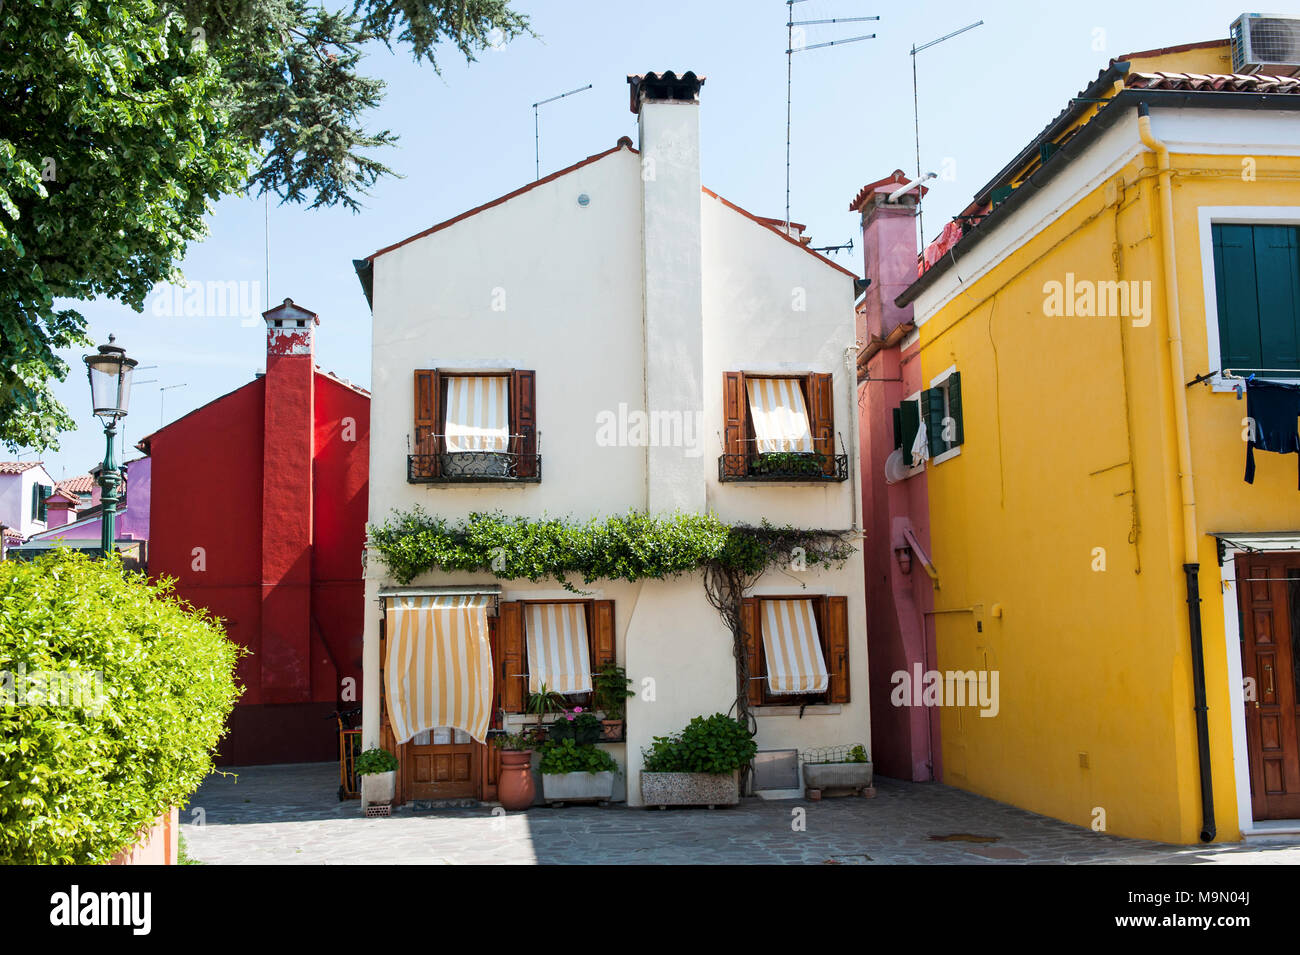 Burano island, Venice, Italy, Europe - beautiful white house - Stock Image